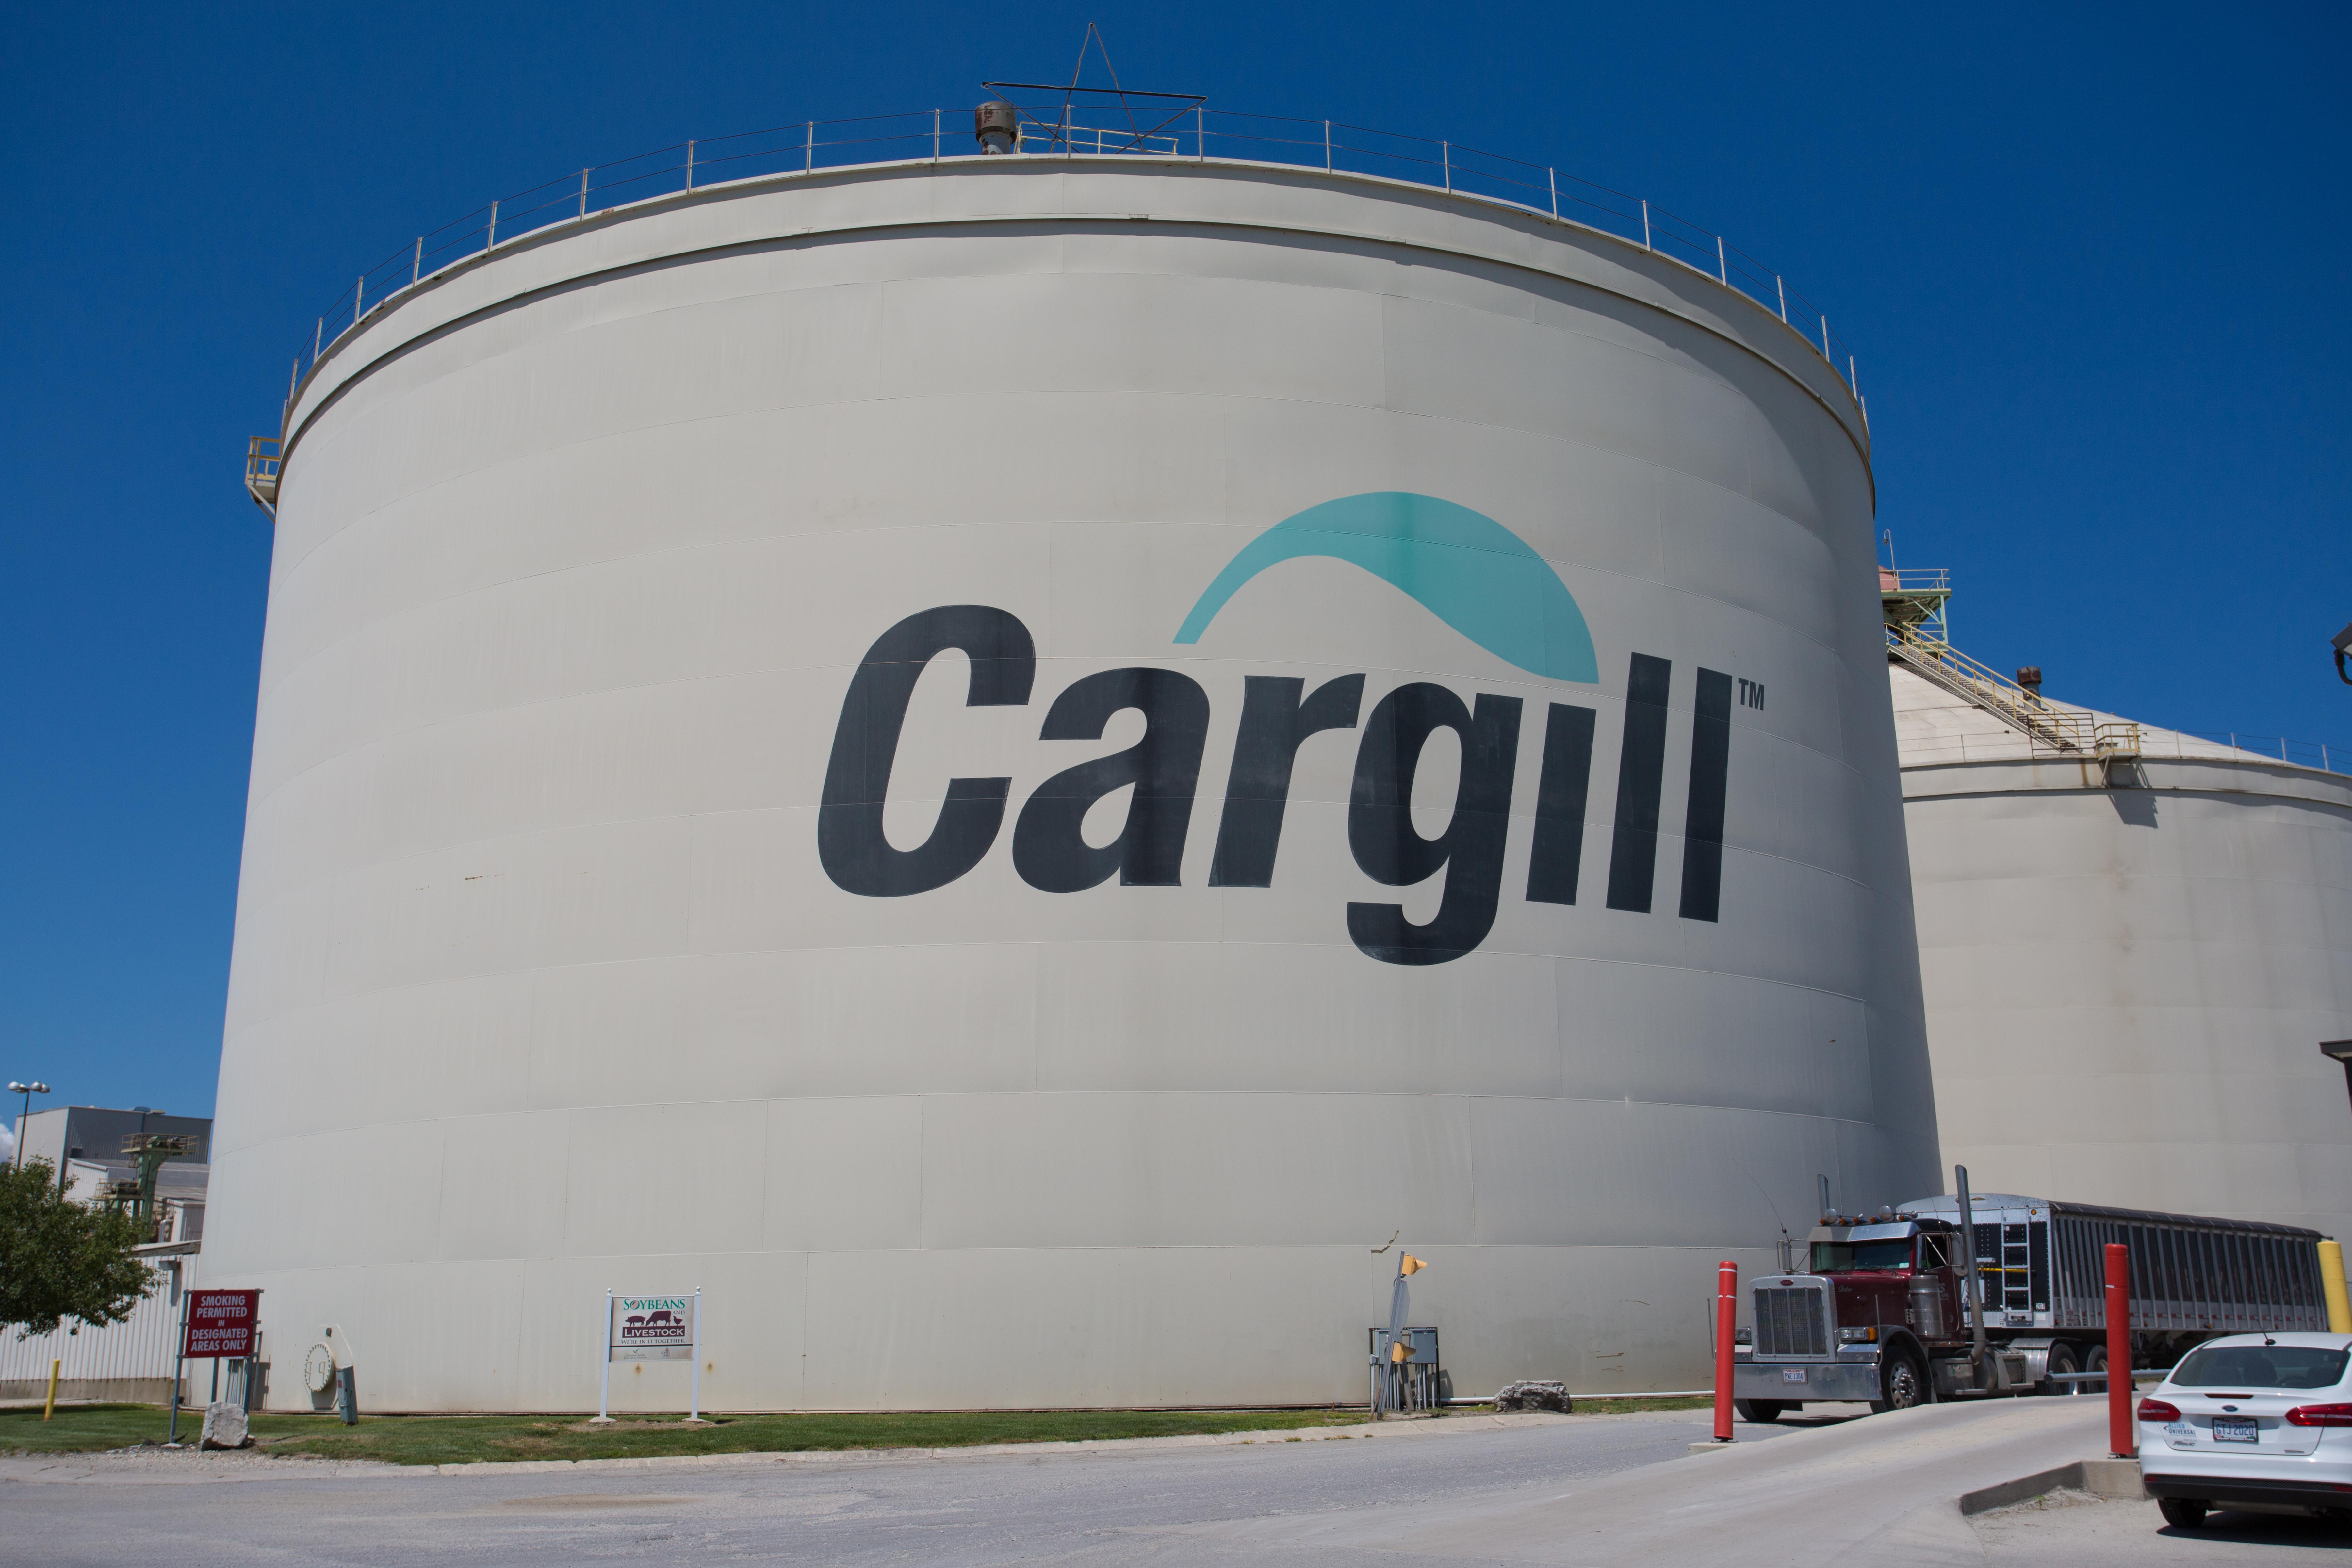 Cargill_sidney-ohio-facility_photo-cred-cargill